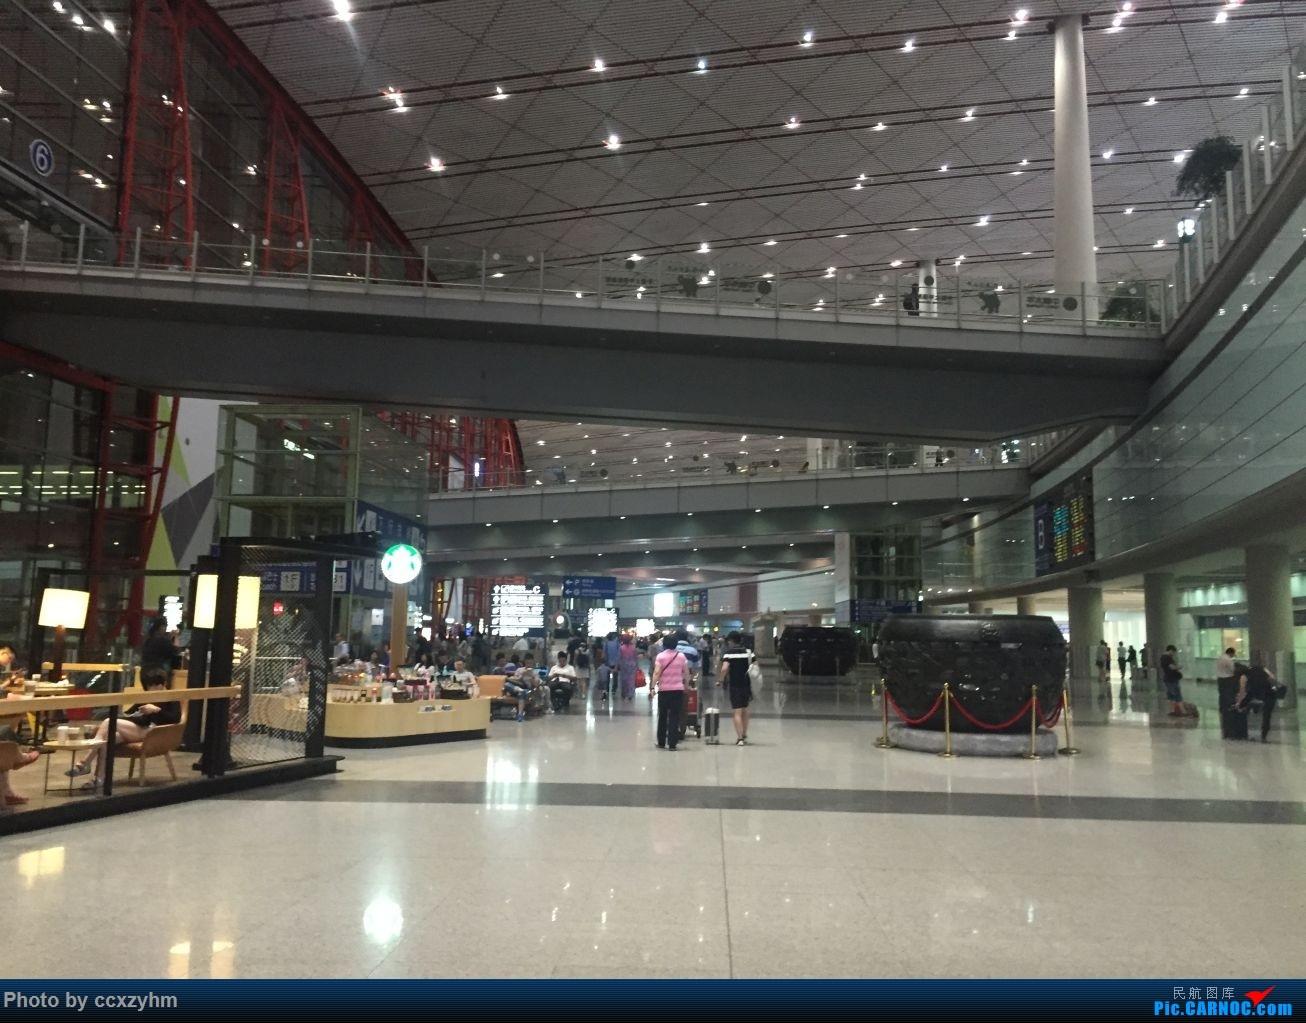 Re:[原创]论坛首发 京沪线上的国航789 高二升高三暑假短Break 空铁联运去北京    中国北京首都国际机场